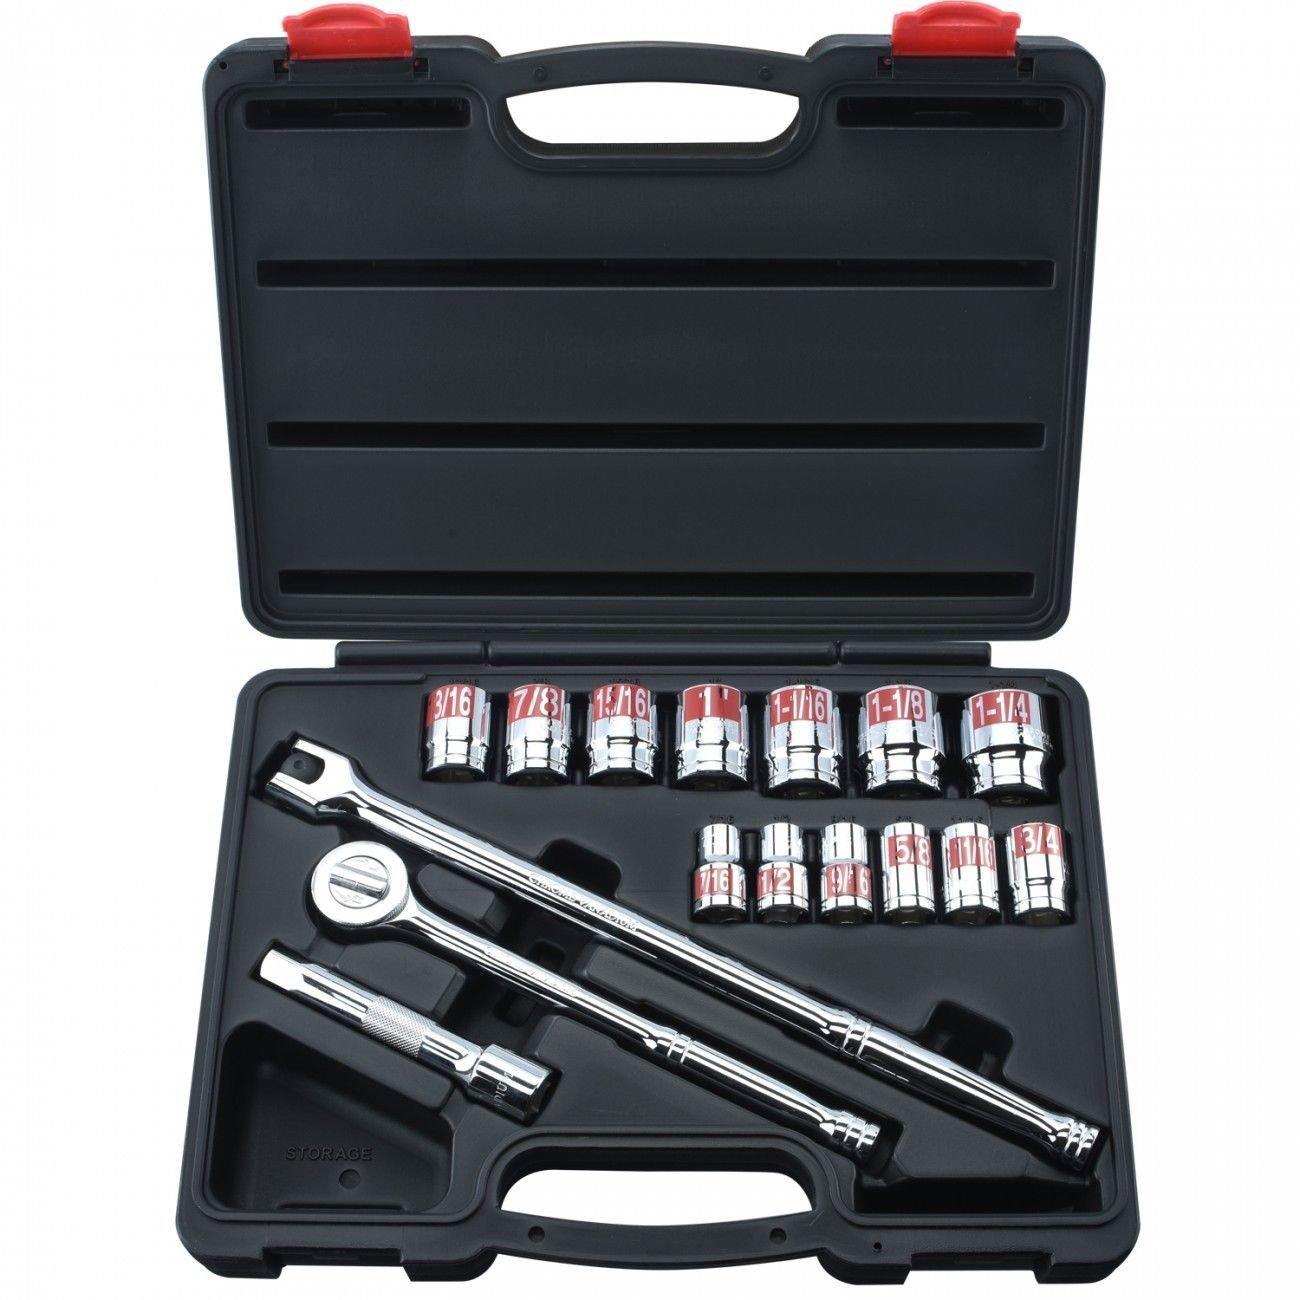 "ESKALEX>>17 Pc 1/2"" Drive Hi-Viz Socket Set SAE W/Ratchet & Breaker Bar Auto Tools And Standard: 7/16, 1/2, 9/16, 5/8, 11/16, 3/4, 13/16, 7/8, 15/16, 1, 1-1/16, 1-1/8, 1-1/4"" Extension: 5"" 1- Ratc"